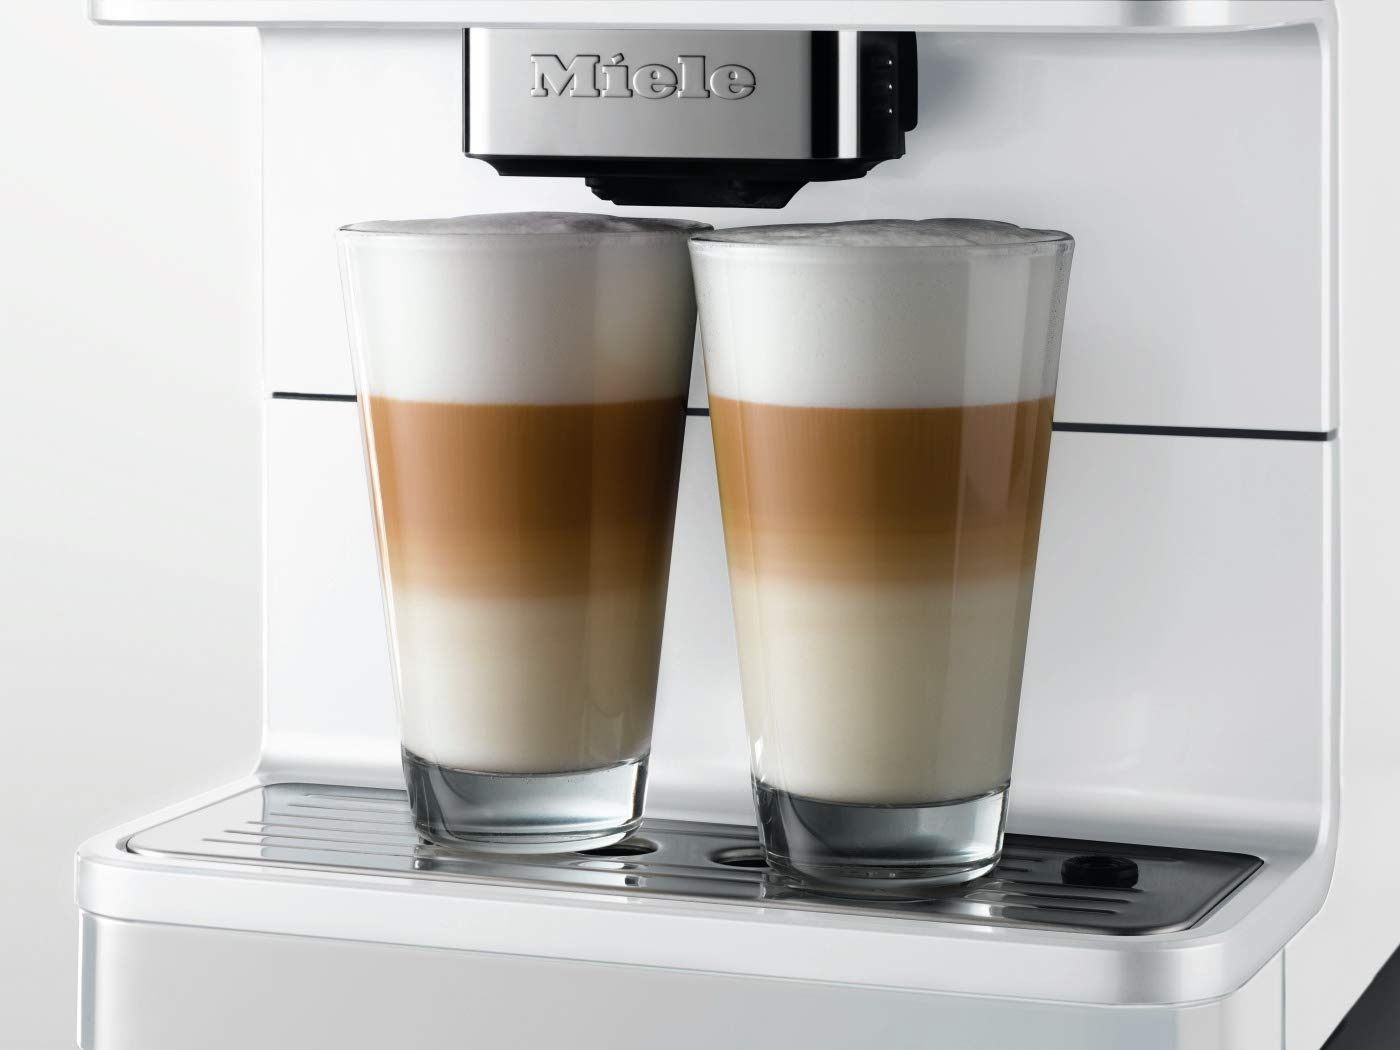 Miele cm6150 Lowe – Cafetera automática lotosweiß: Amazon.es: Hogar